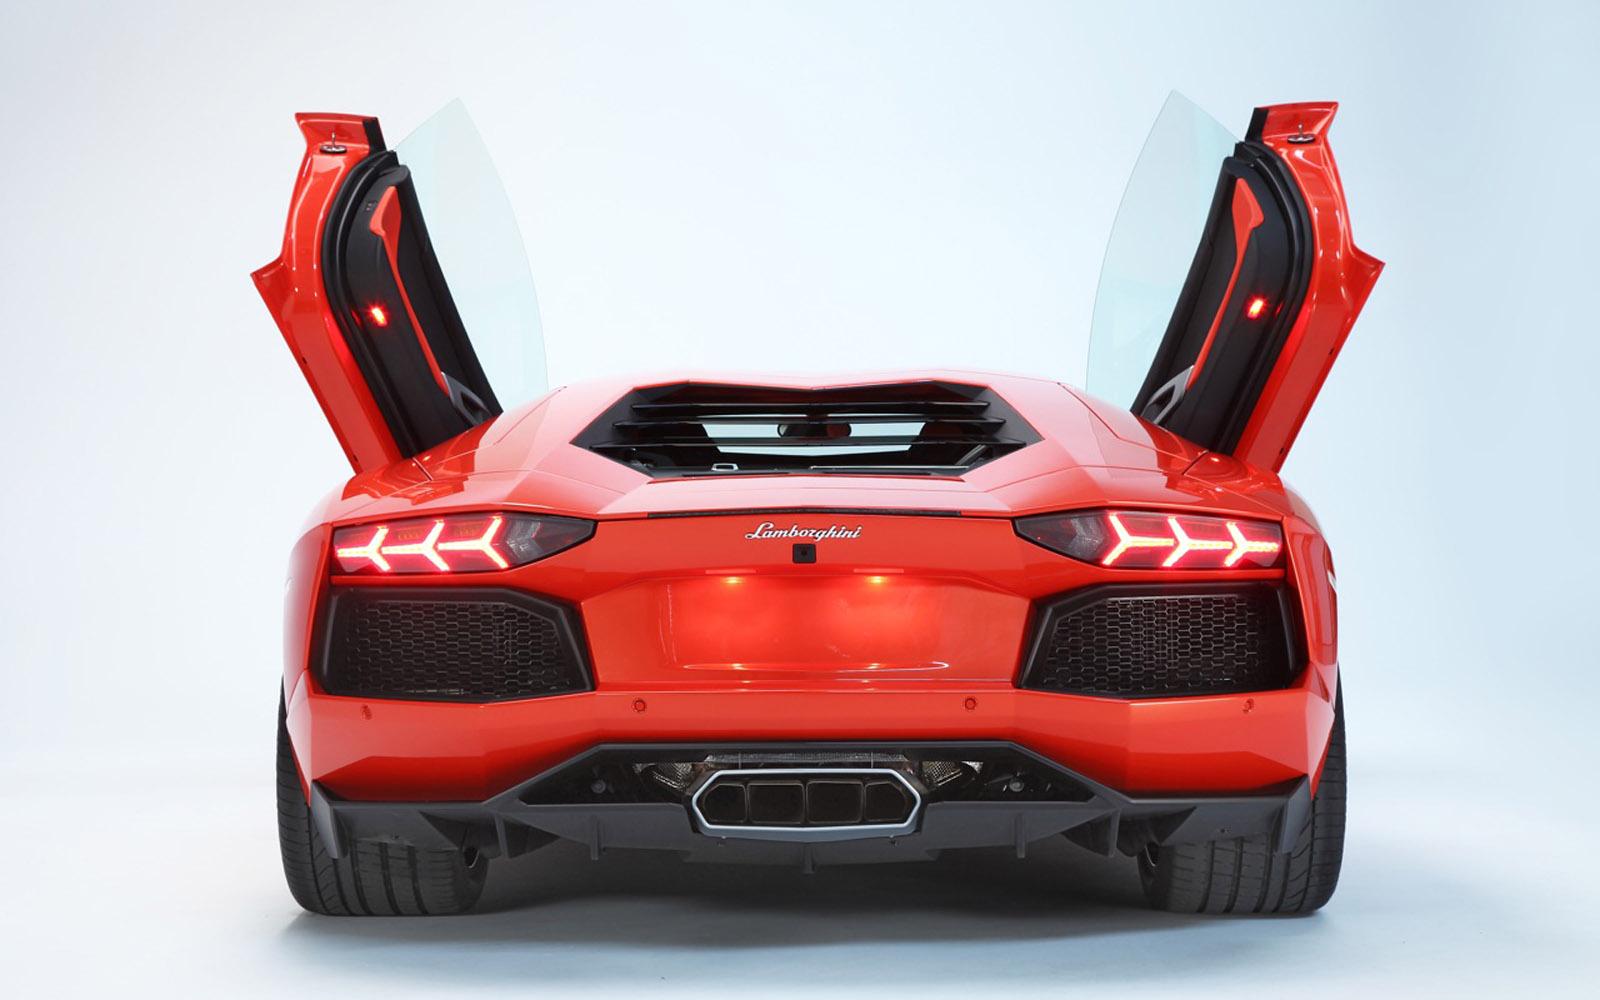 Lamborghini Aventador Lp 700 4 Pictures Hd Wallpapers